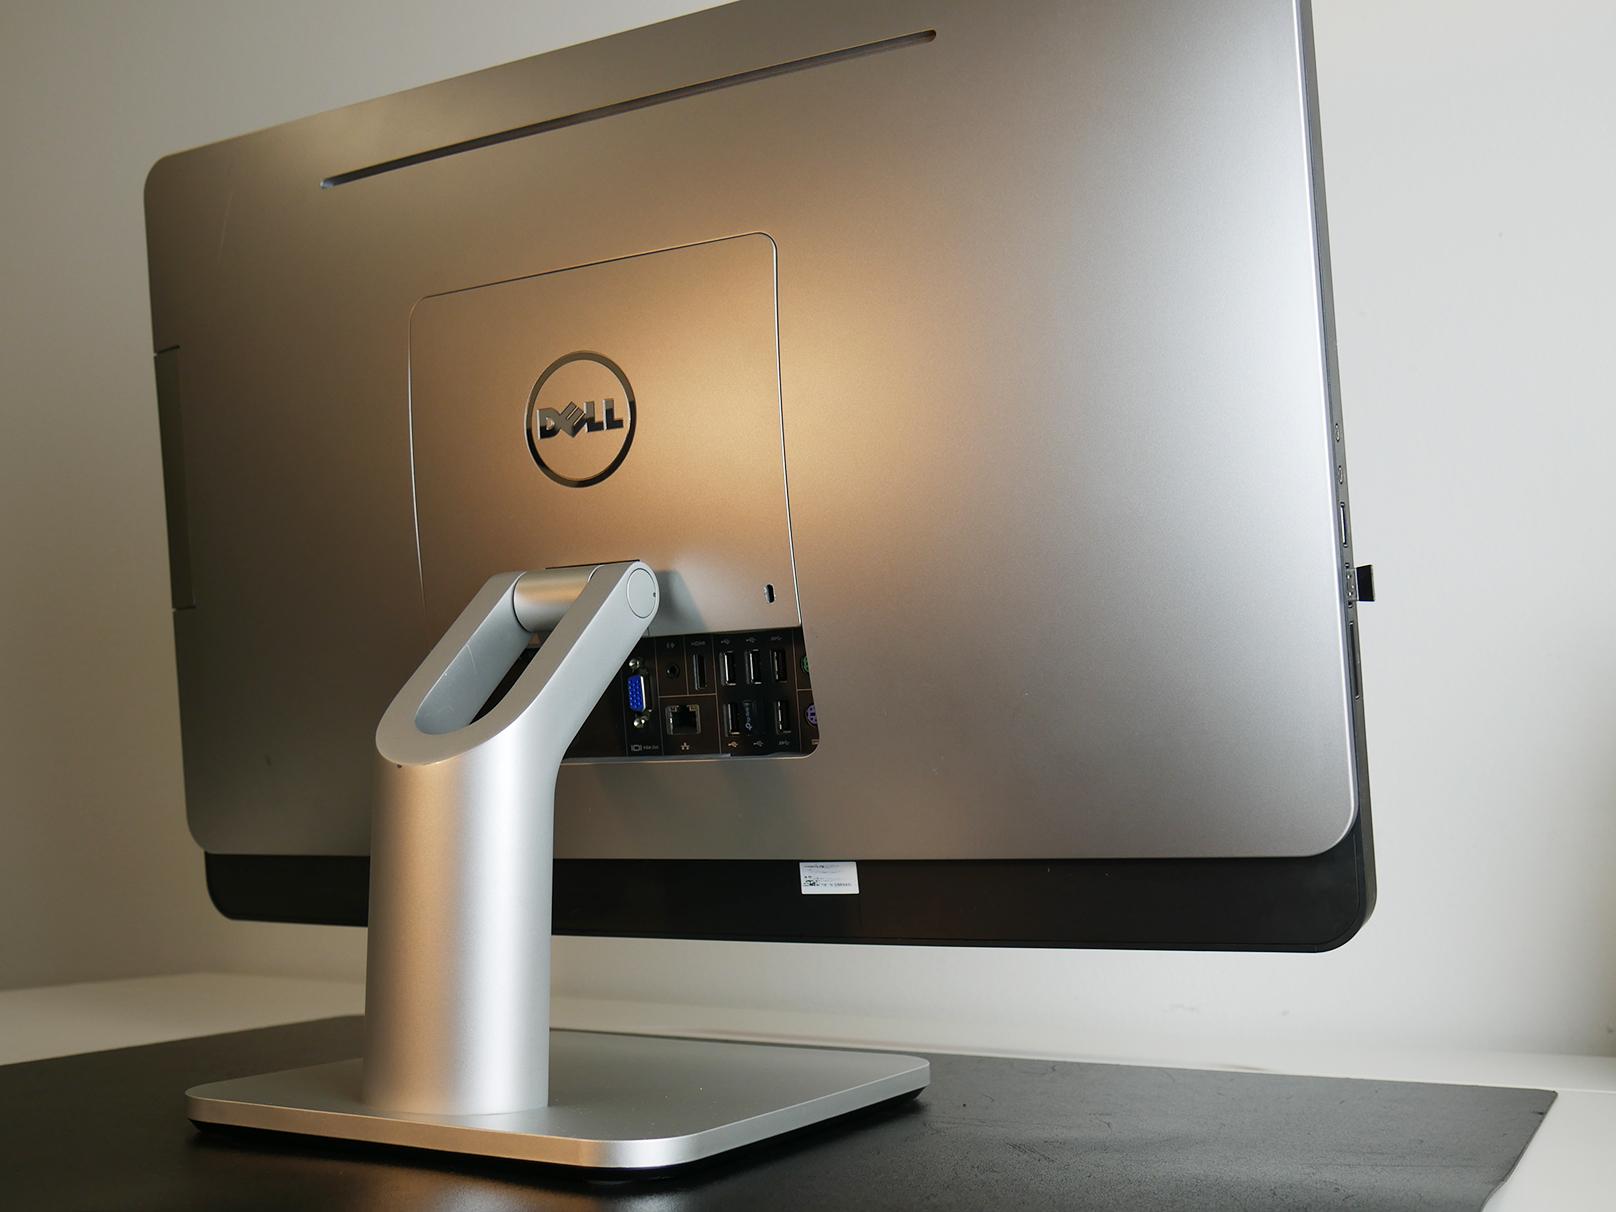 Komputer do pracy biurowej